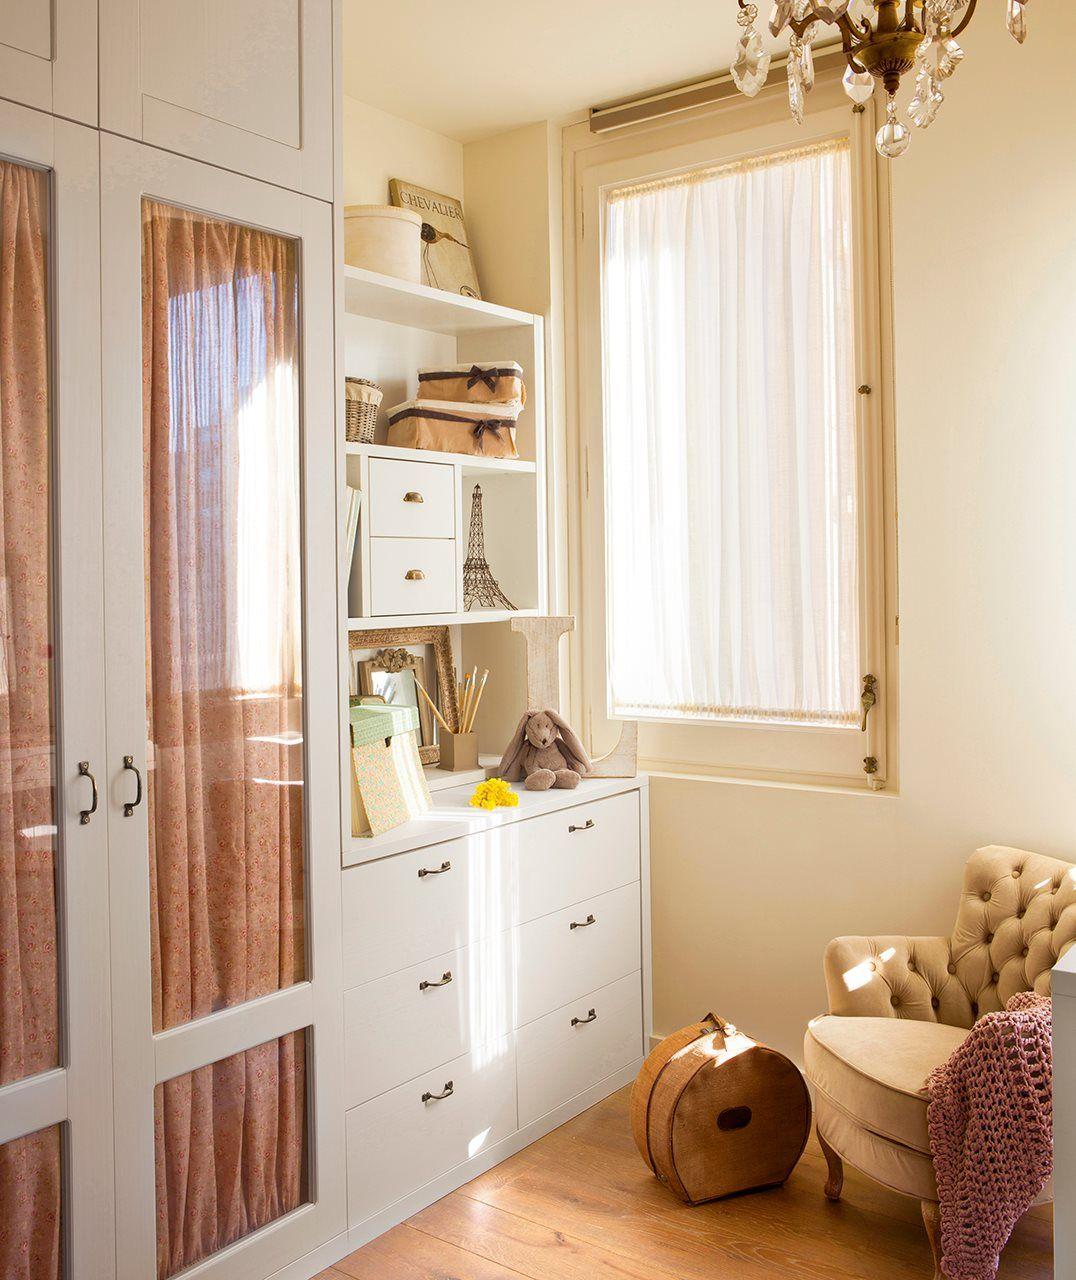 armarios empotrados dormitorios nios dormitorios infantiles ideas hogar habitacin juvenil hogares vestidor entradas escritorio